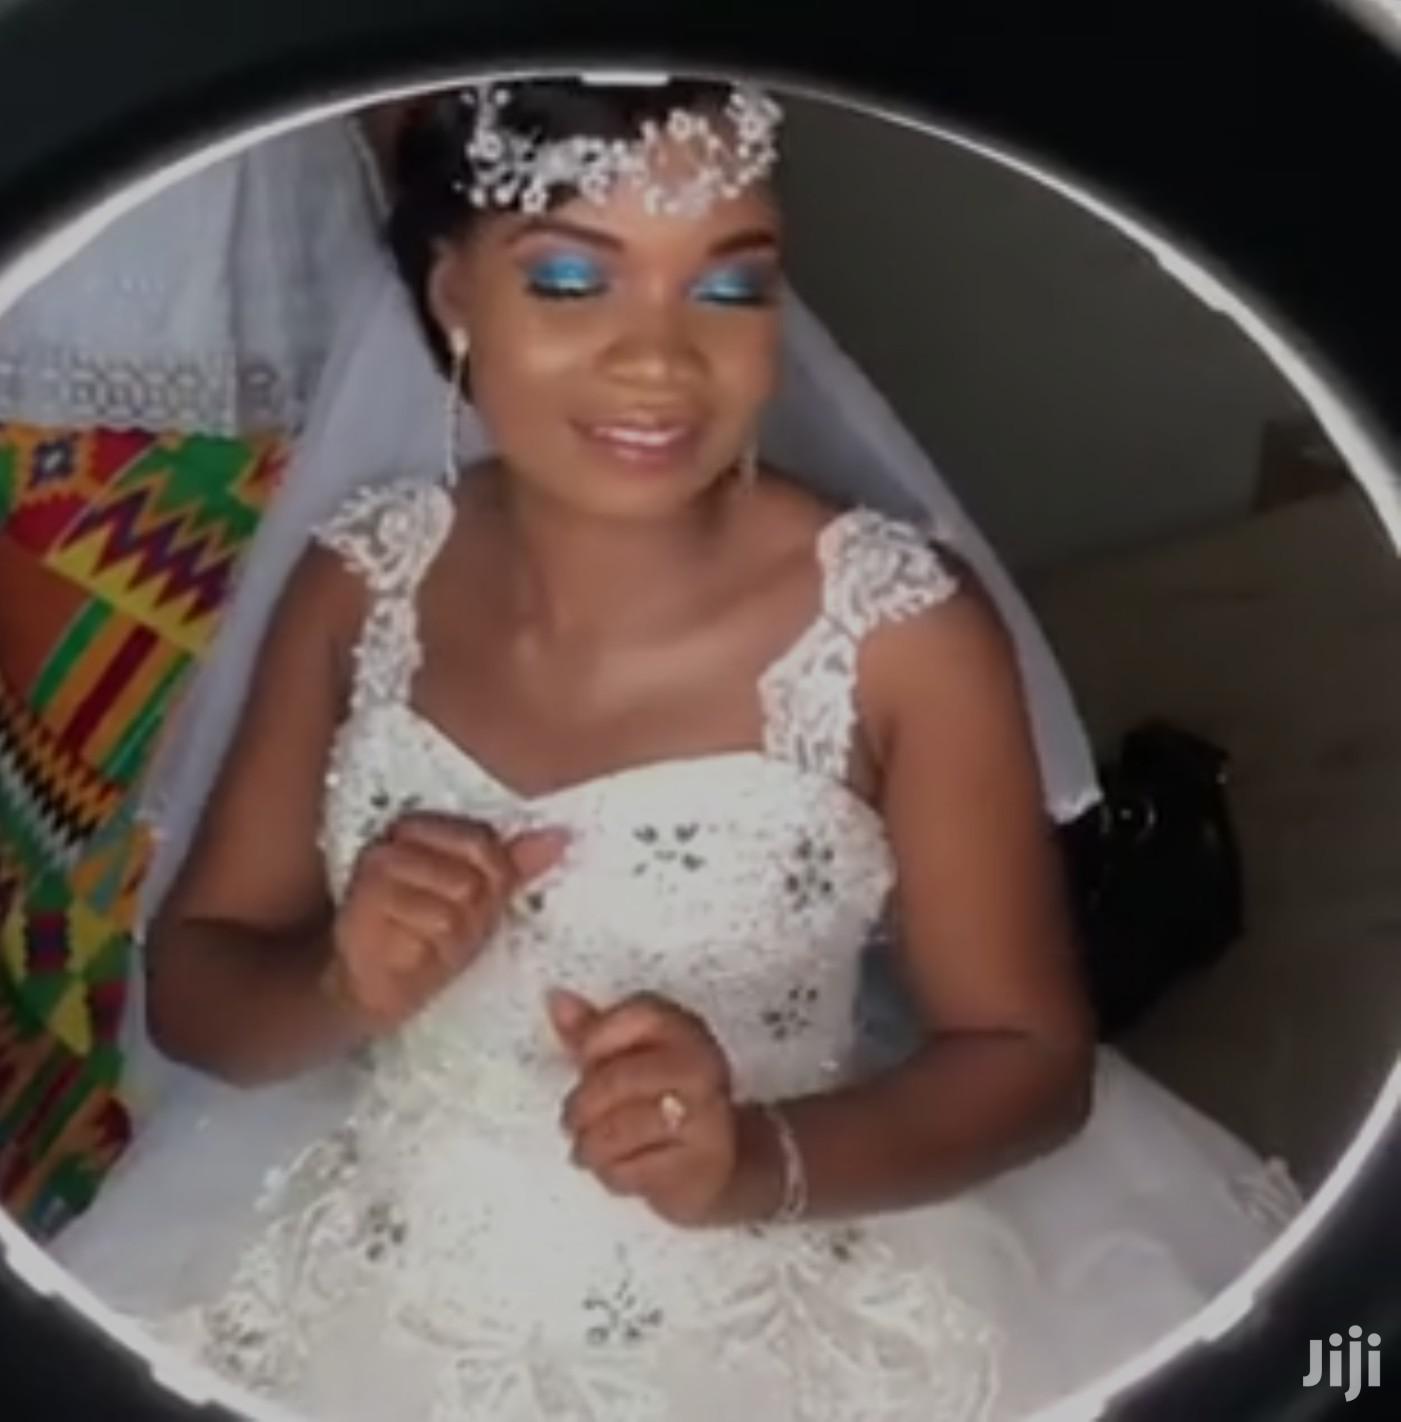 Bridal Makeup | Health & Beauty Services for sale in Kumasi Metropolitan, Ashanti, Ghana